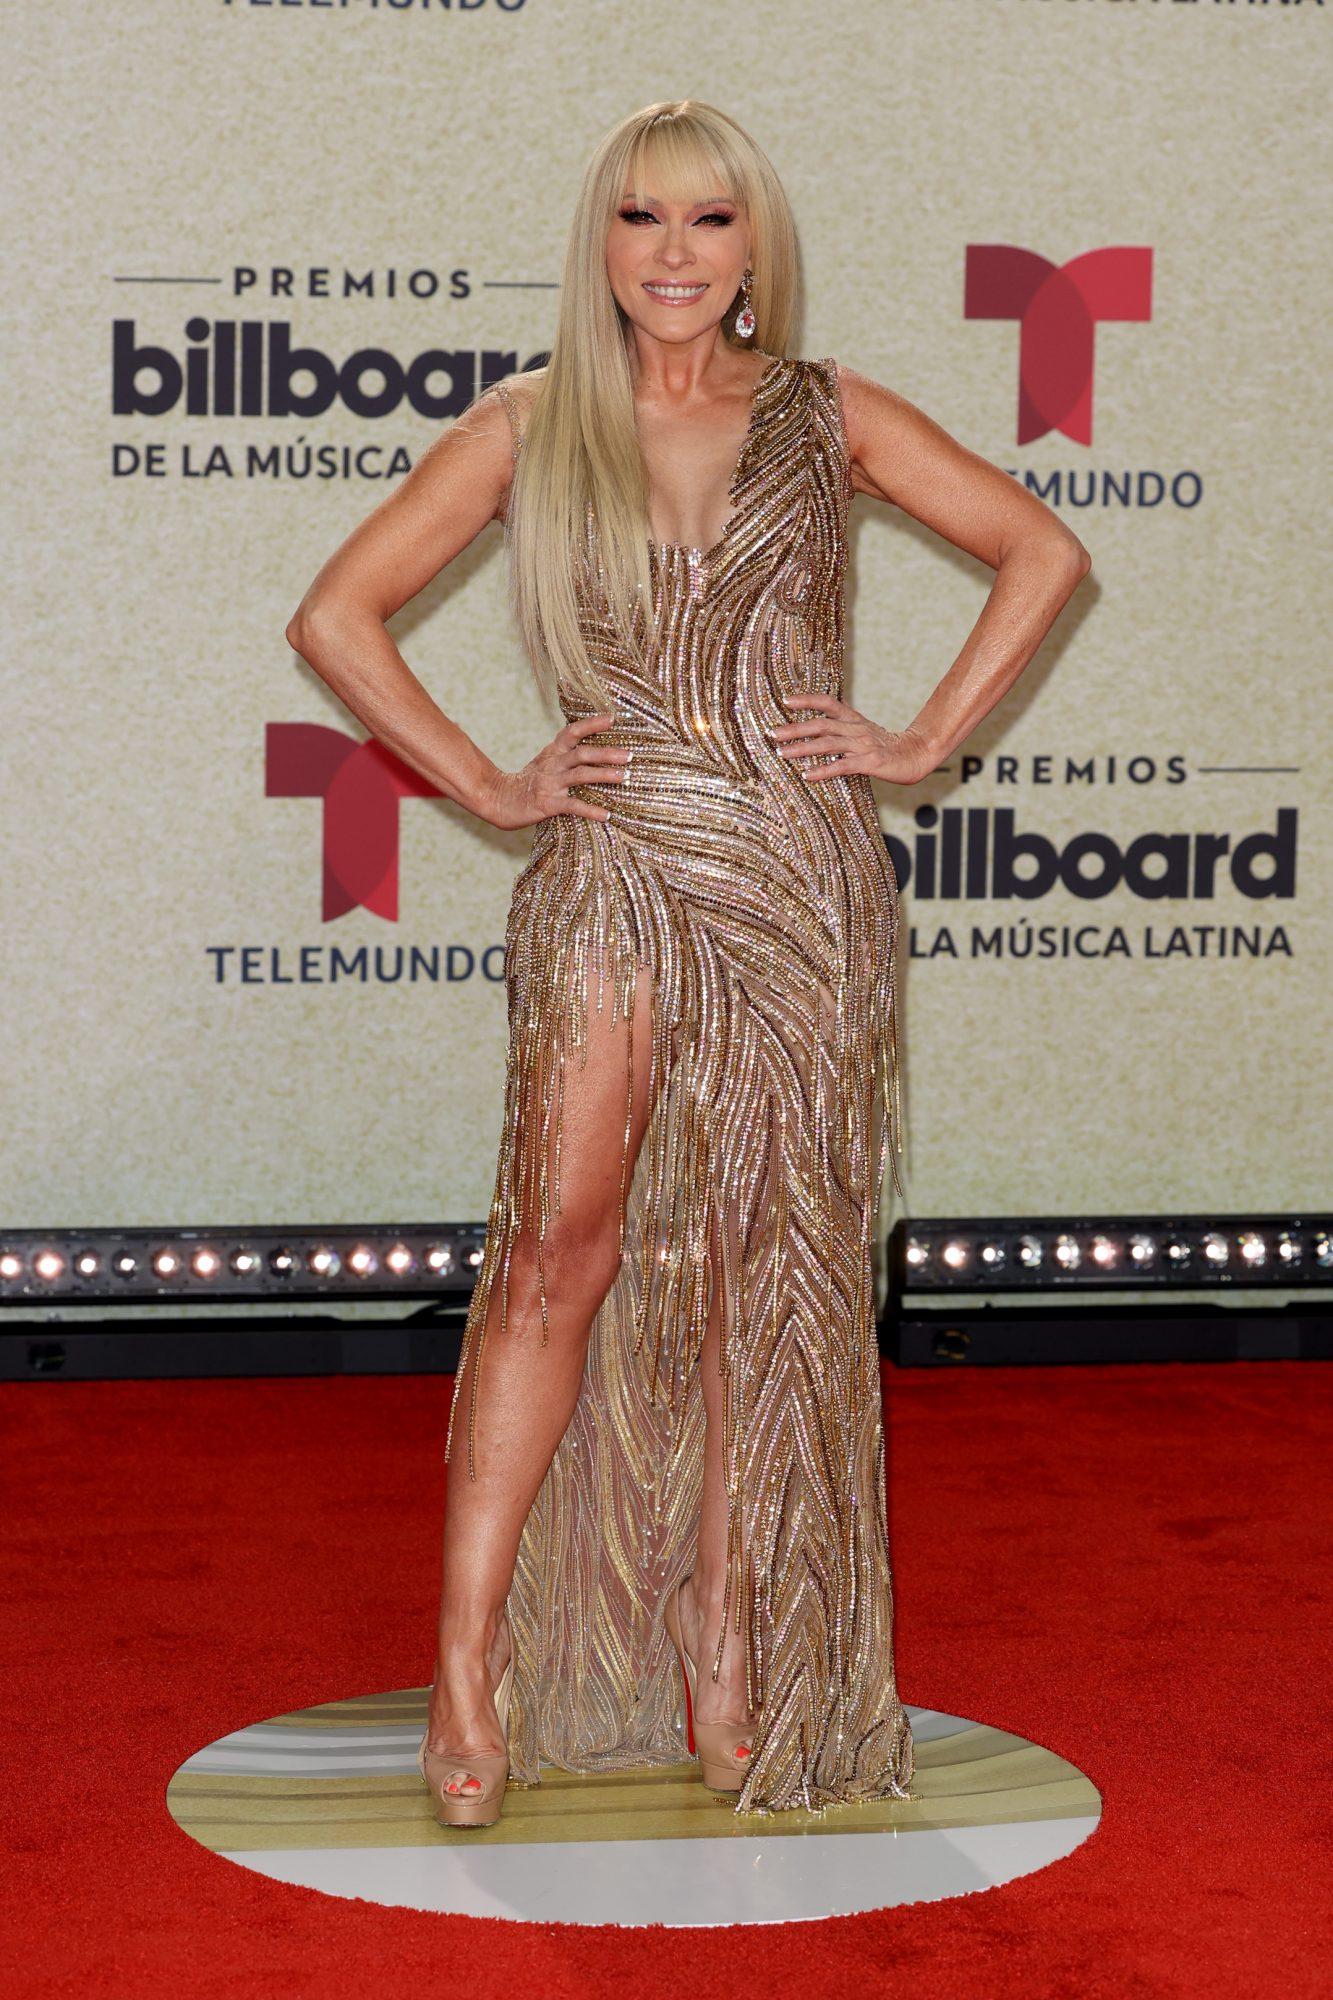 Yuri, premios Billboard 2021